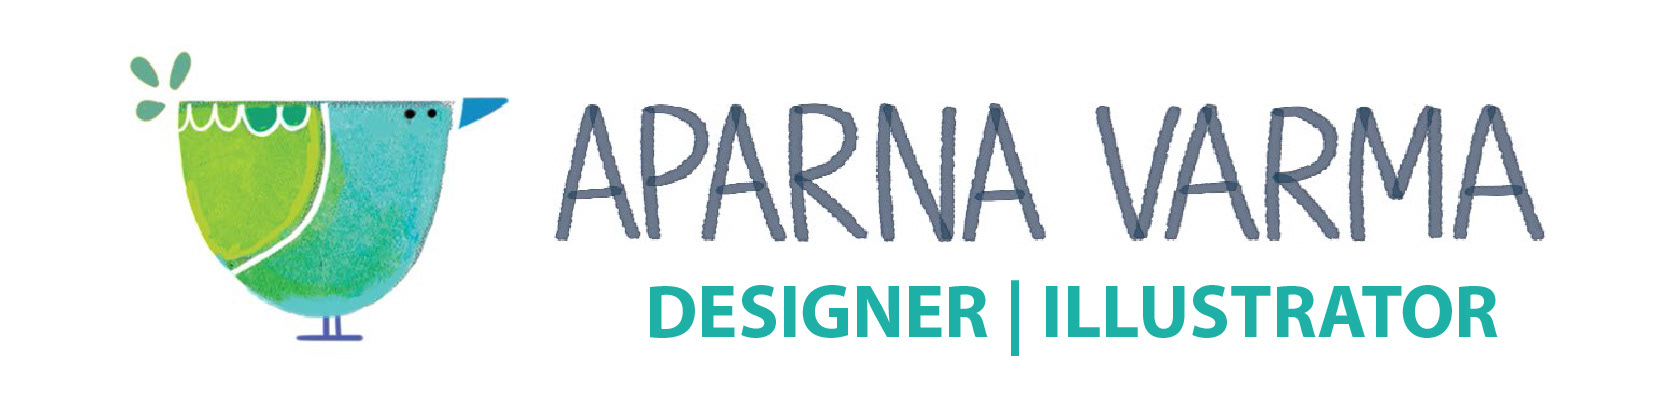 Aparna Varma - Designer - Illustrator